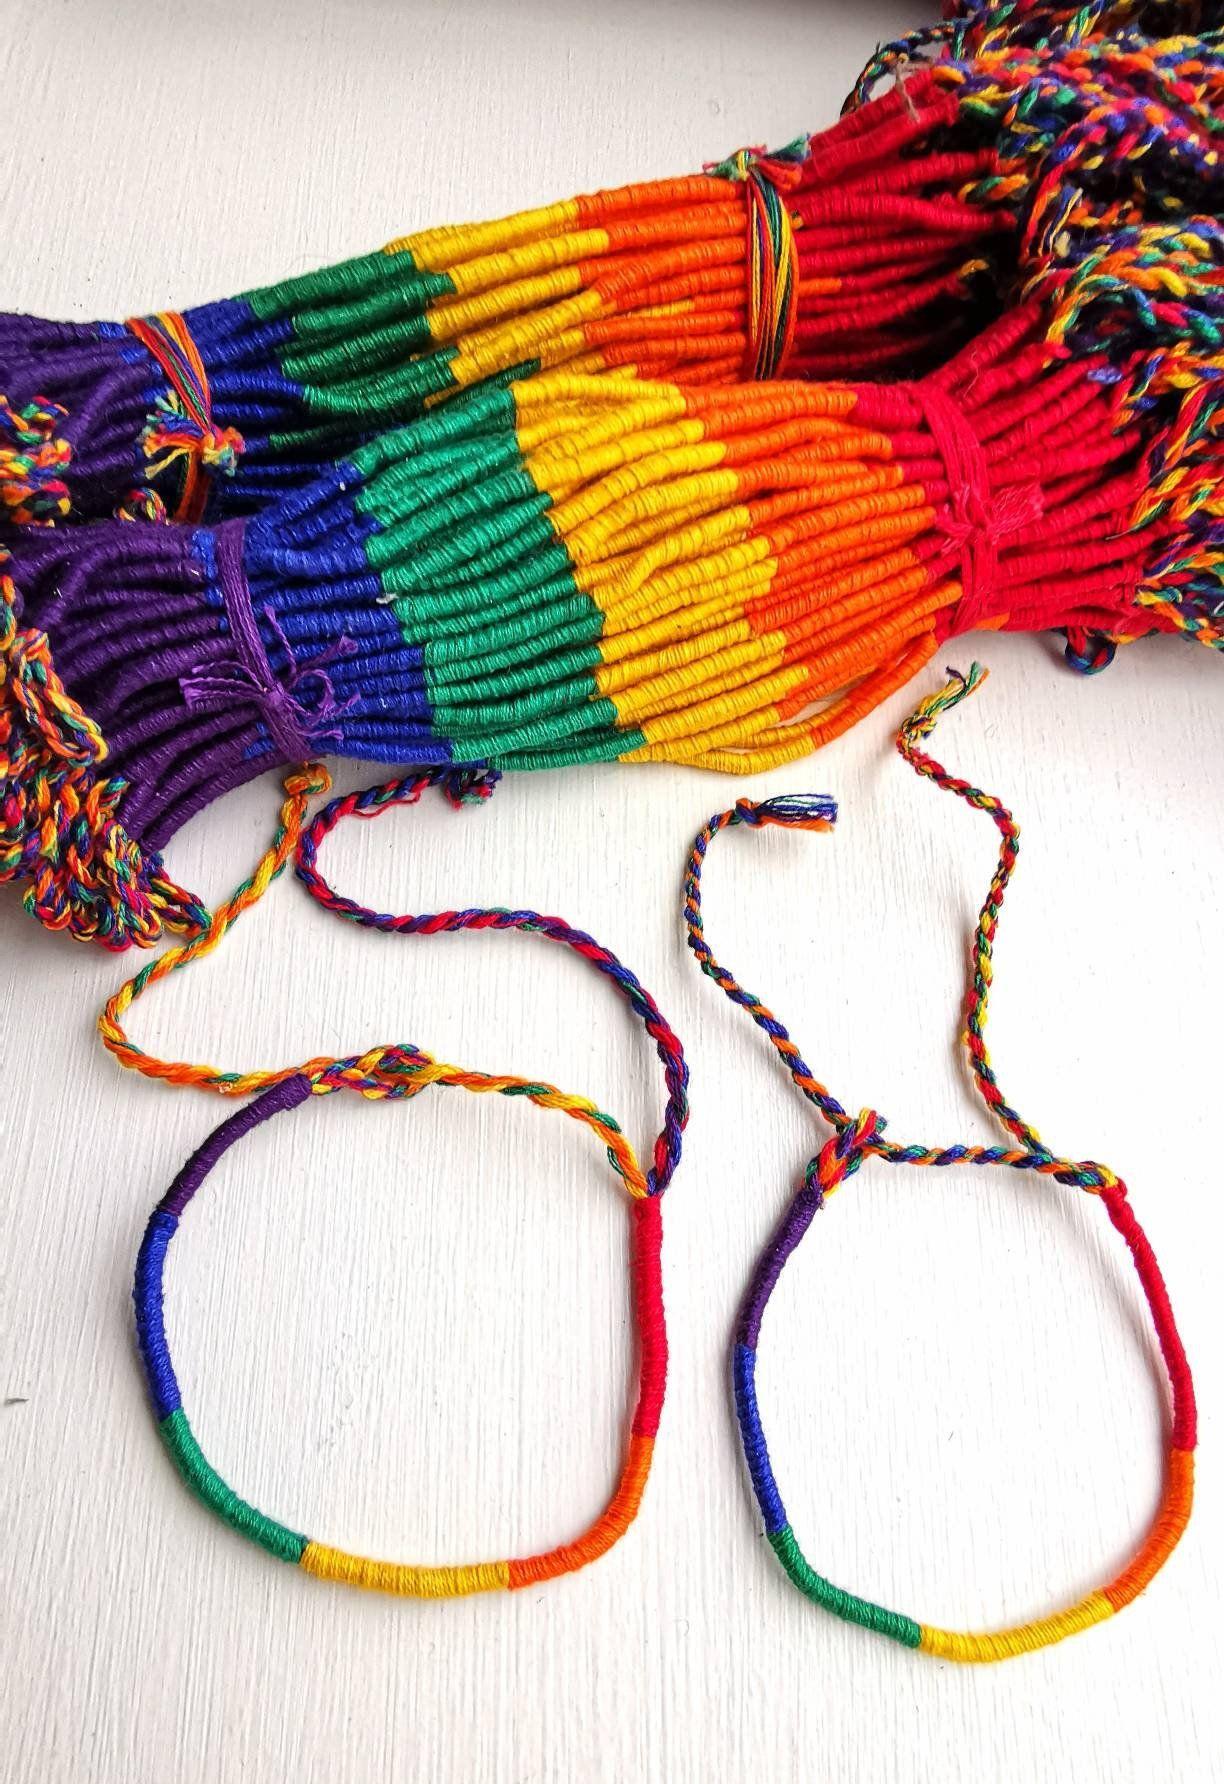 21409b5b98b Woven Rainbow Colour Friendship Bracelet, Thin Round Design, Best Friend  Gift, Hippie, Boho Chic Bracelet, Beach Jewelry, string Wristband